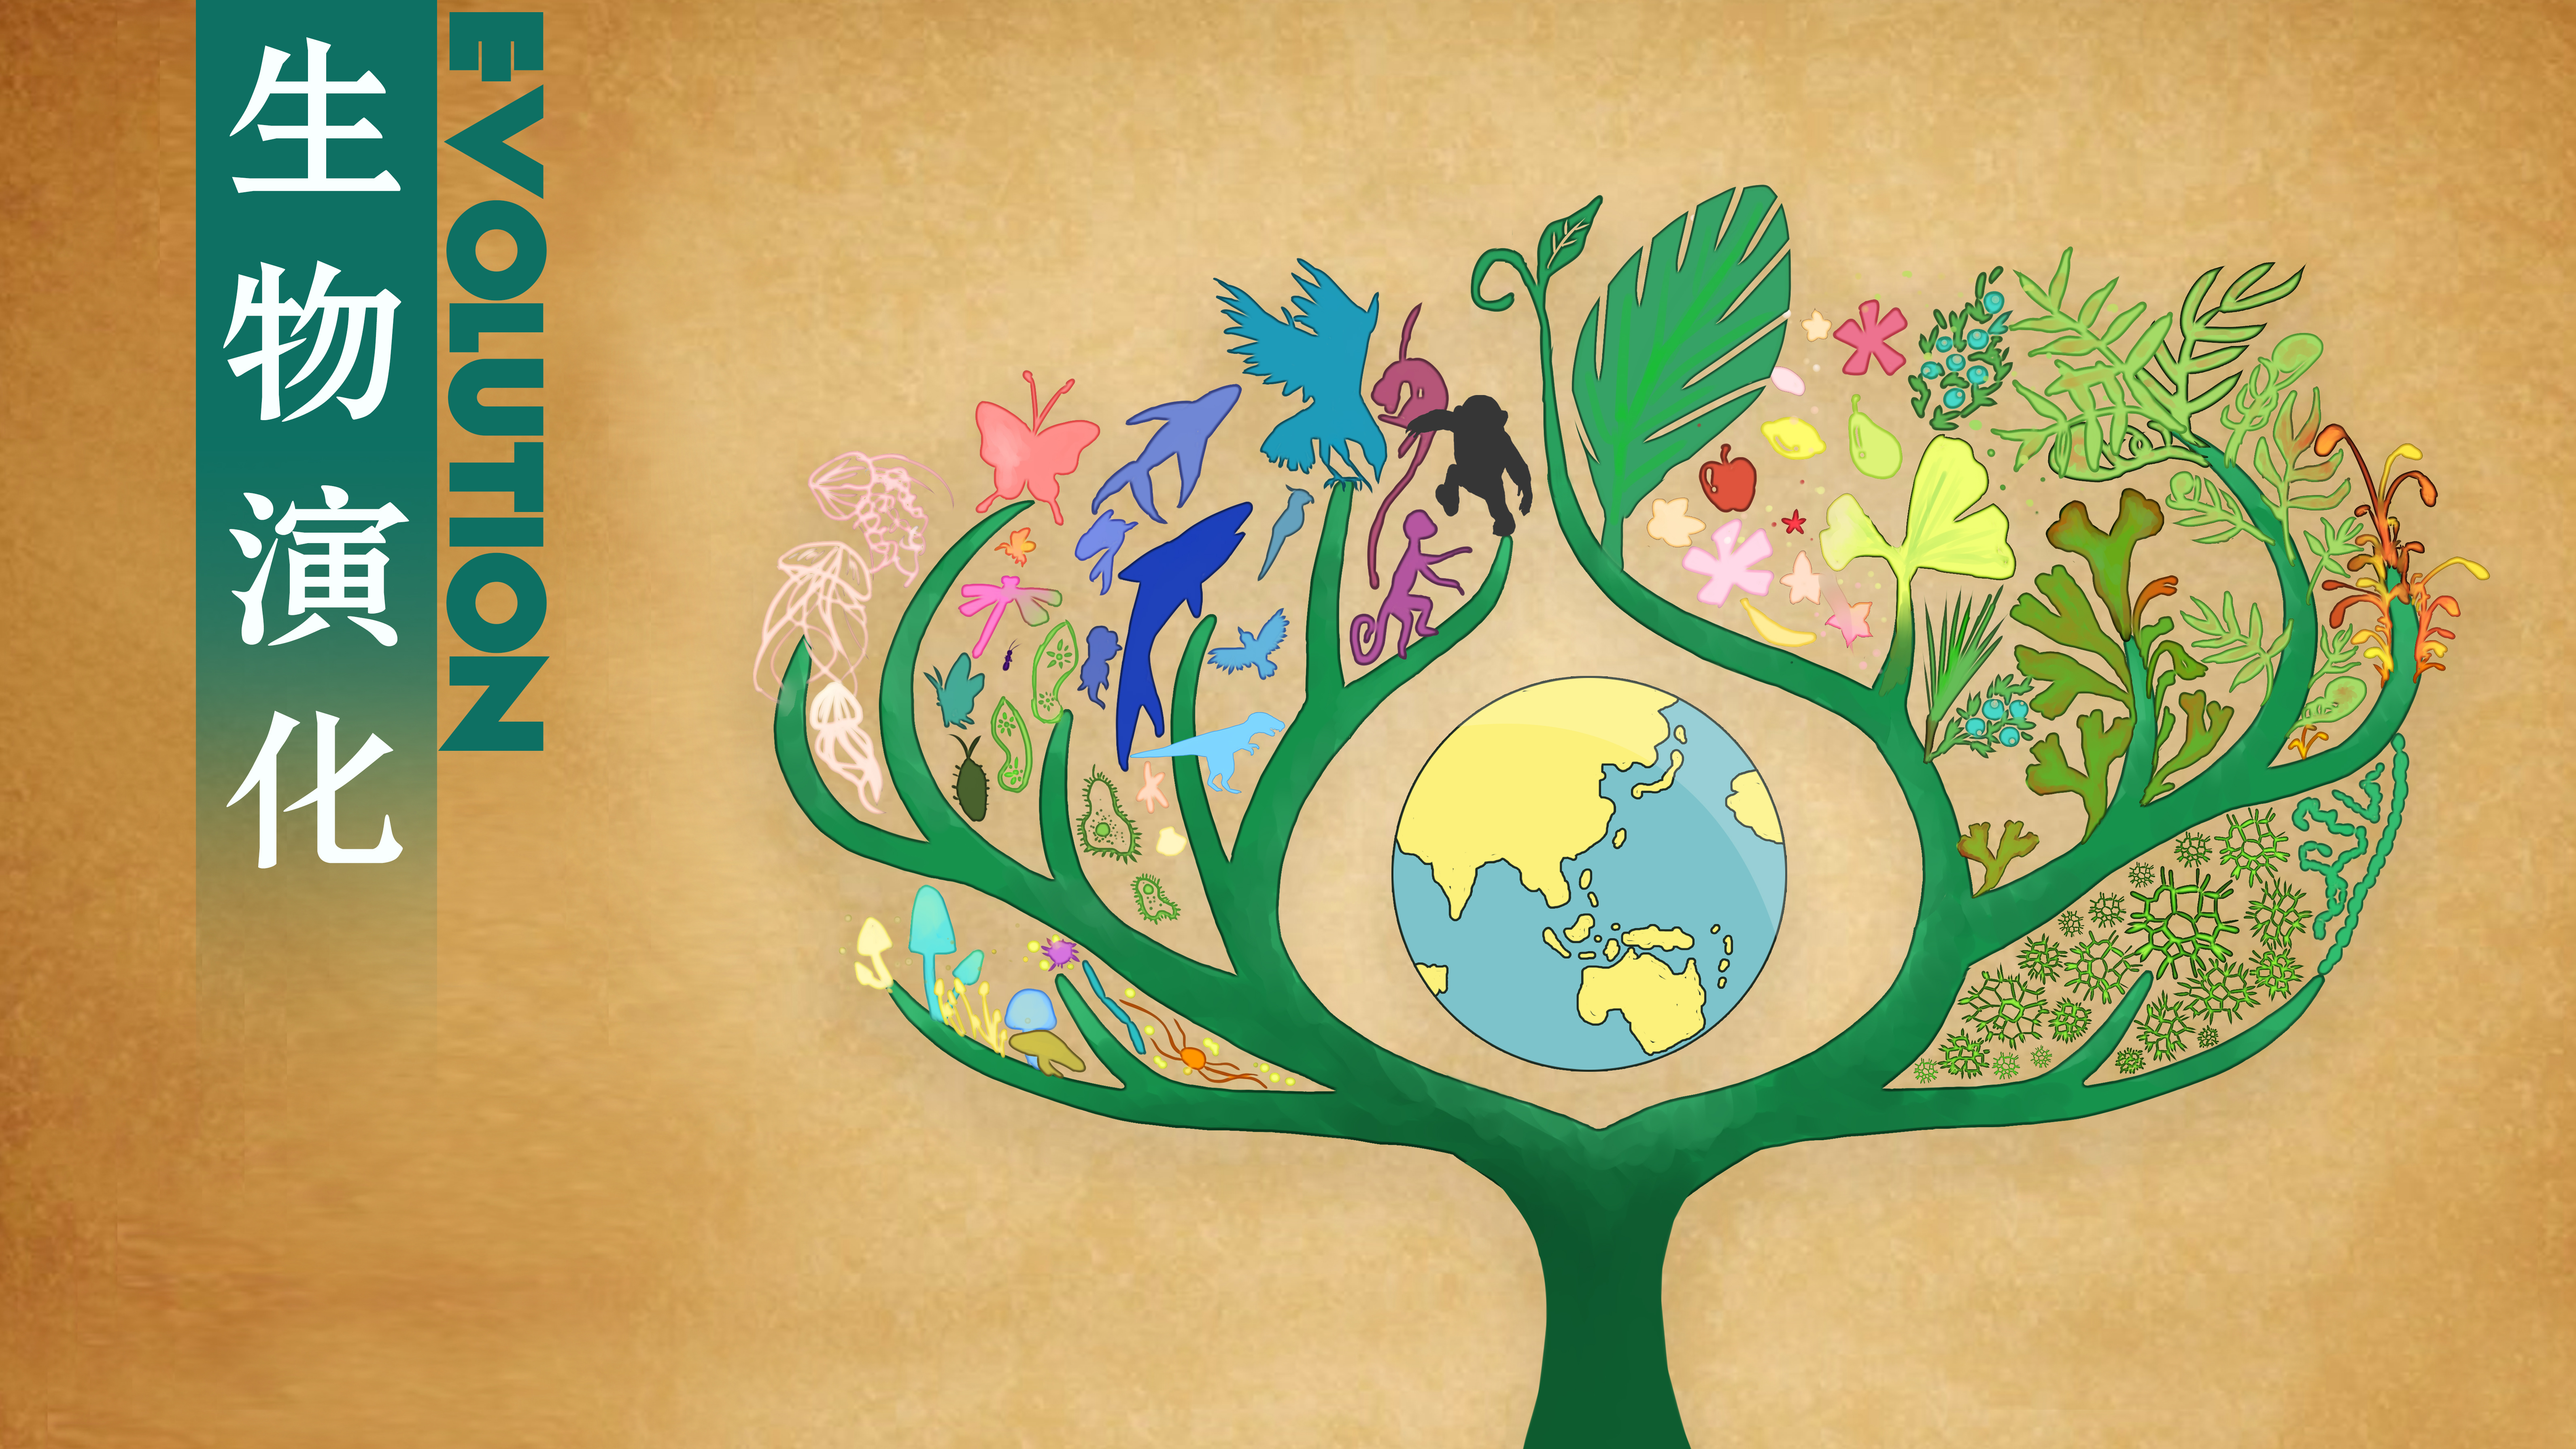 生物演化 course image